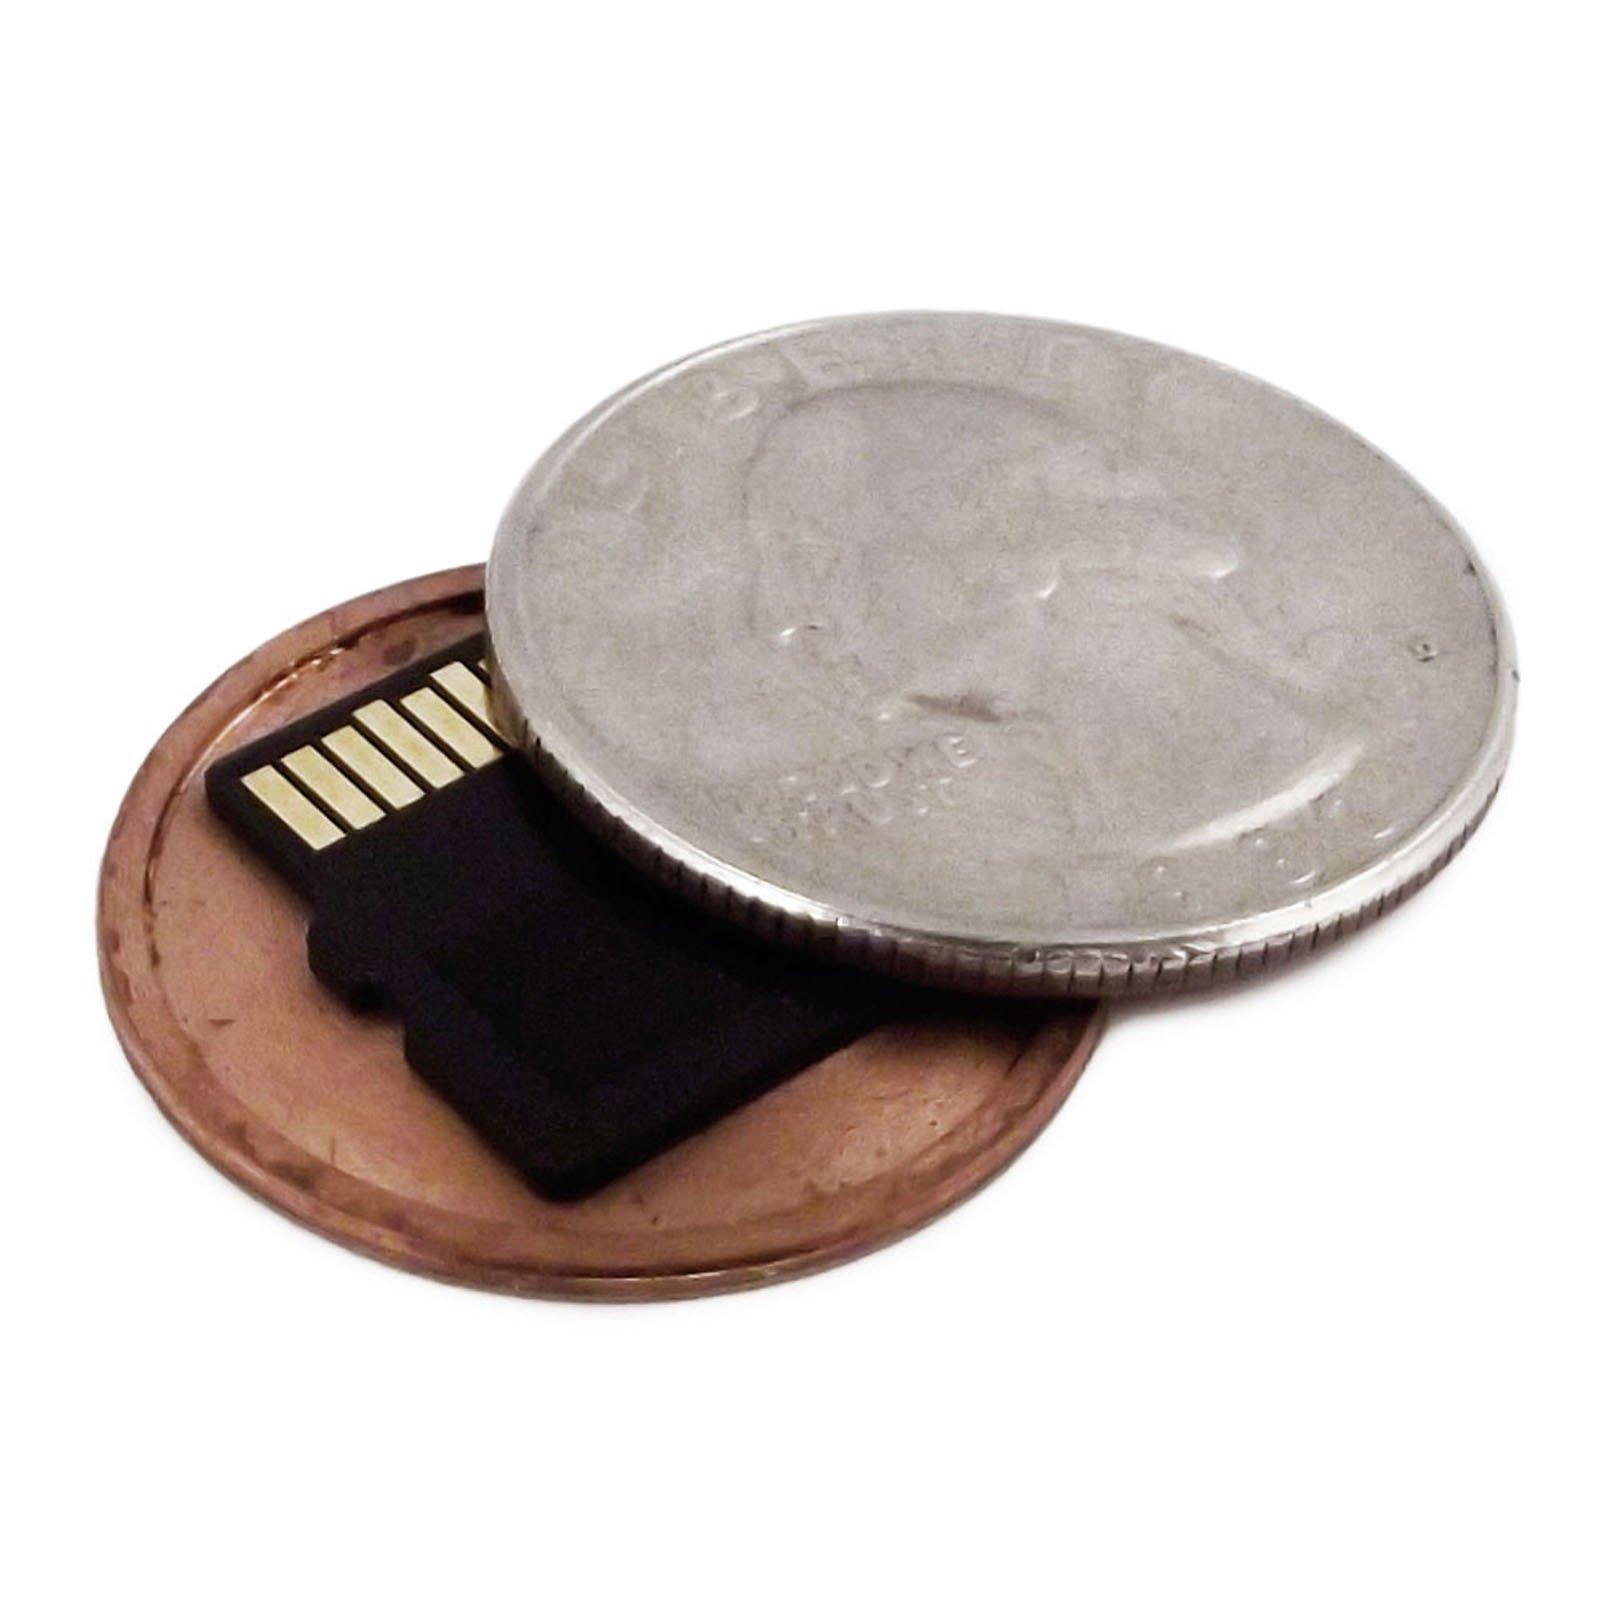 US Mint Spy Coin Quarter